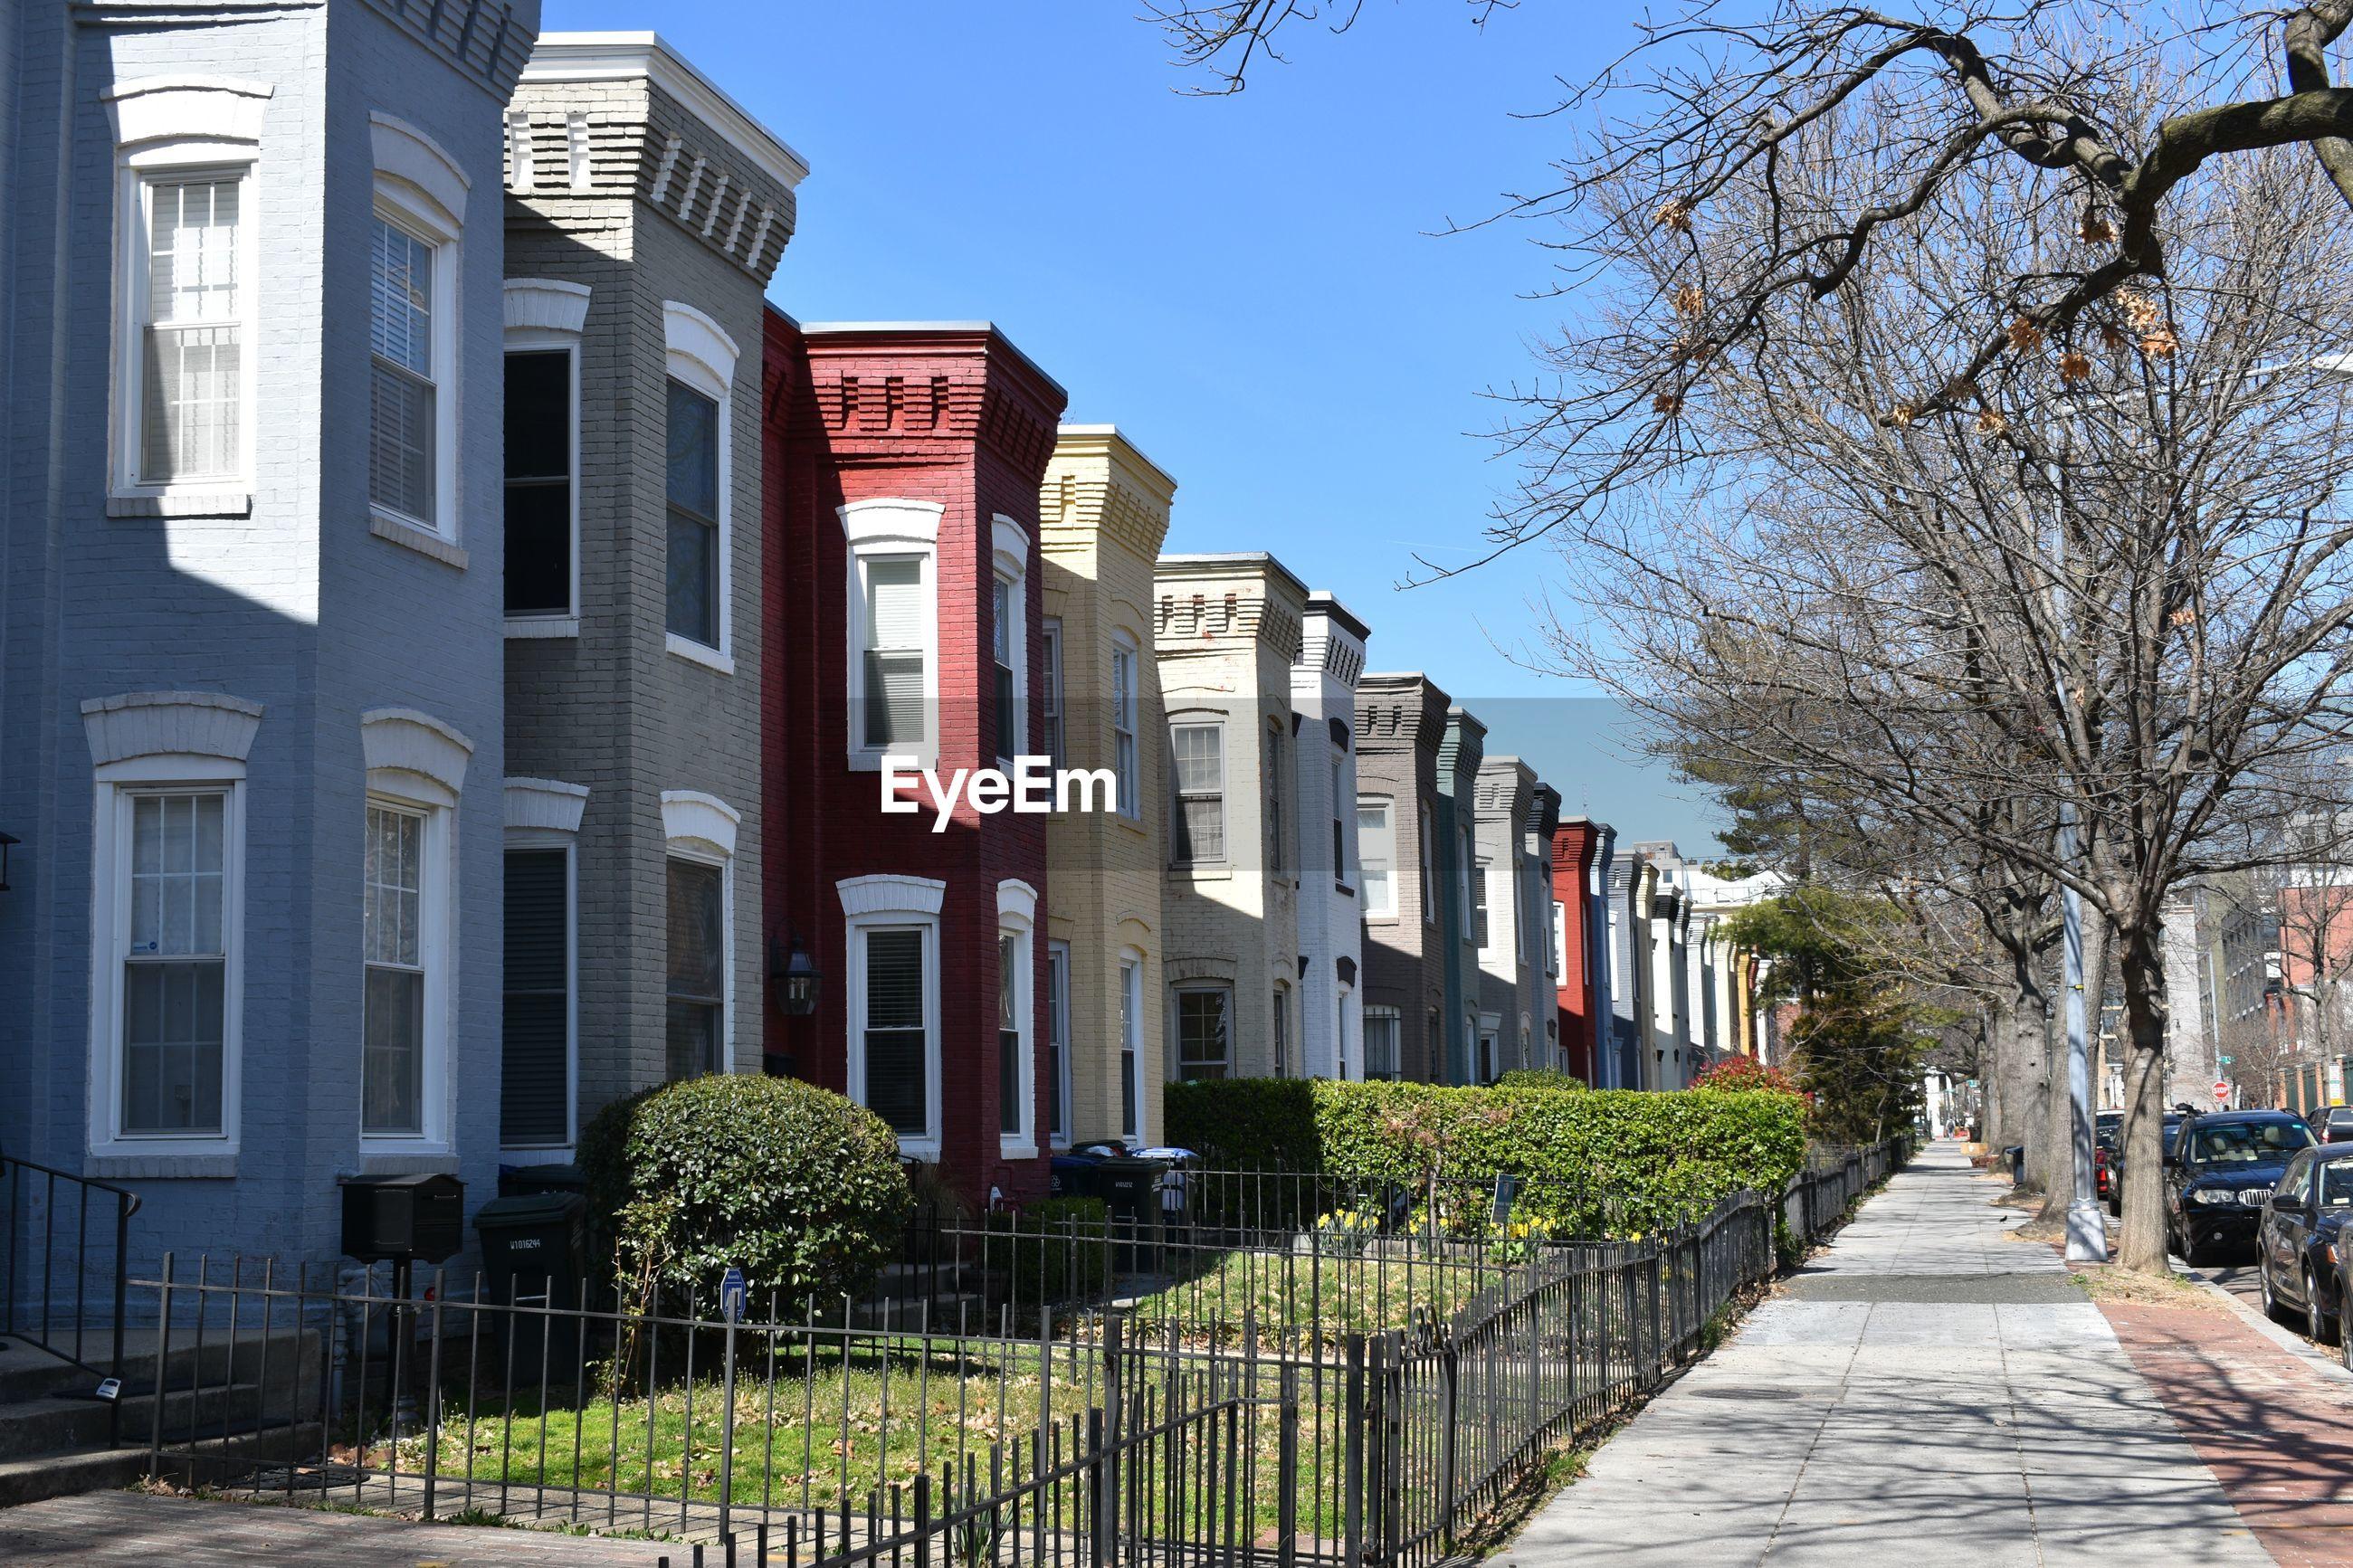 FOOTPATH AMIDST BUILDINGS AGAINST CLEAR SKY